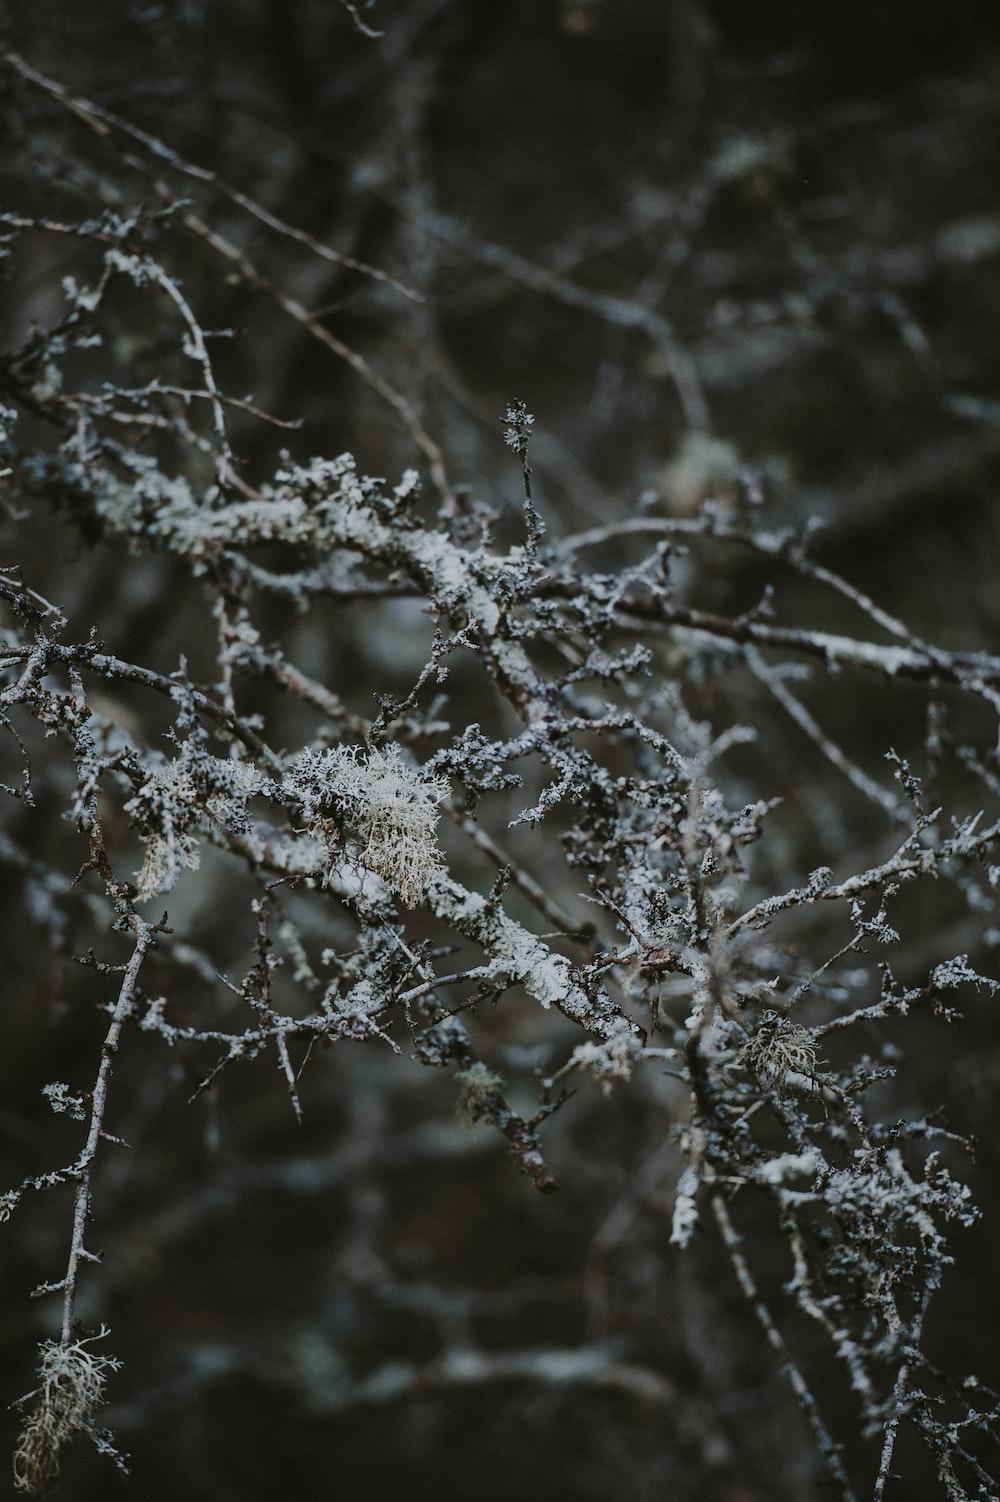 closeup photo of leafless twigs